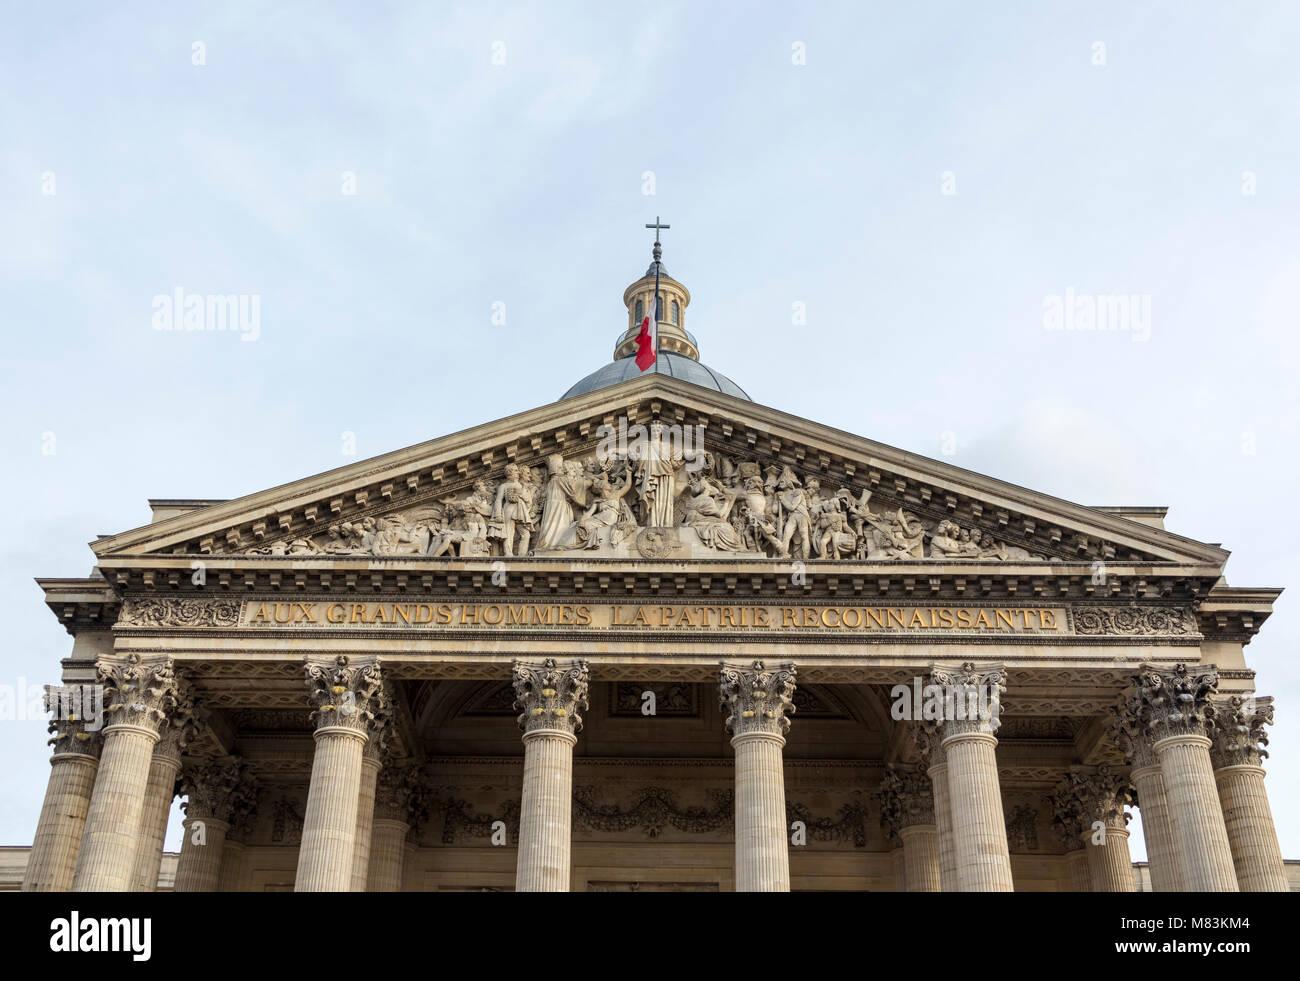 entrance and pediment of the Pantheon, Paris, France Stock Photo